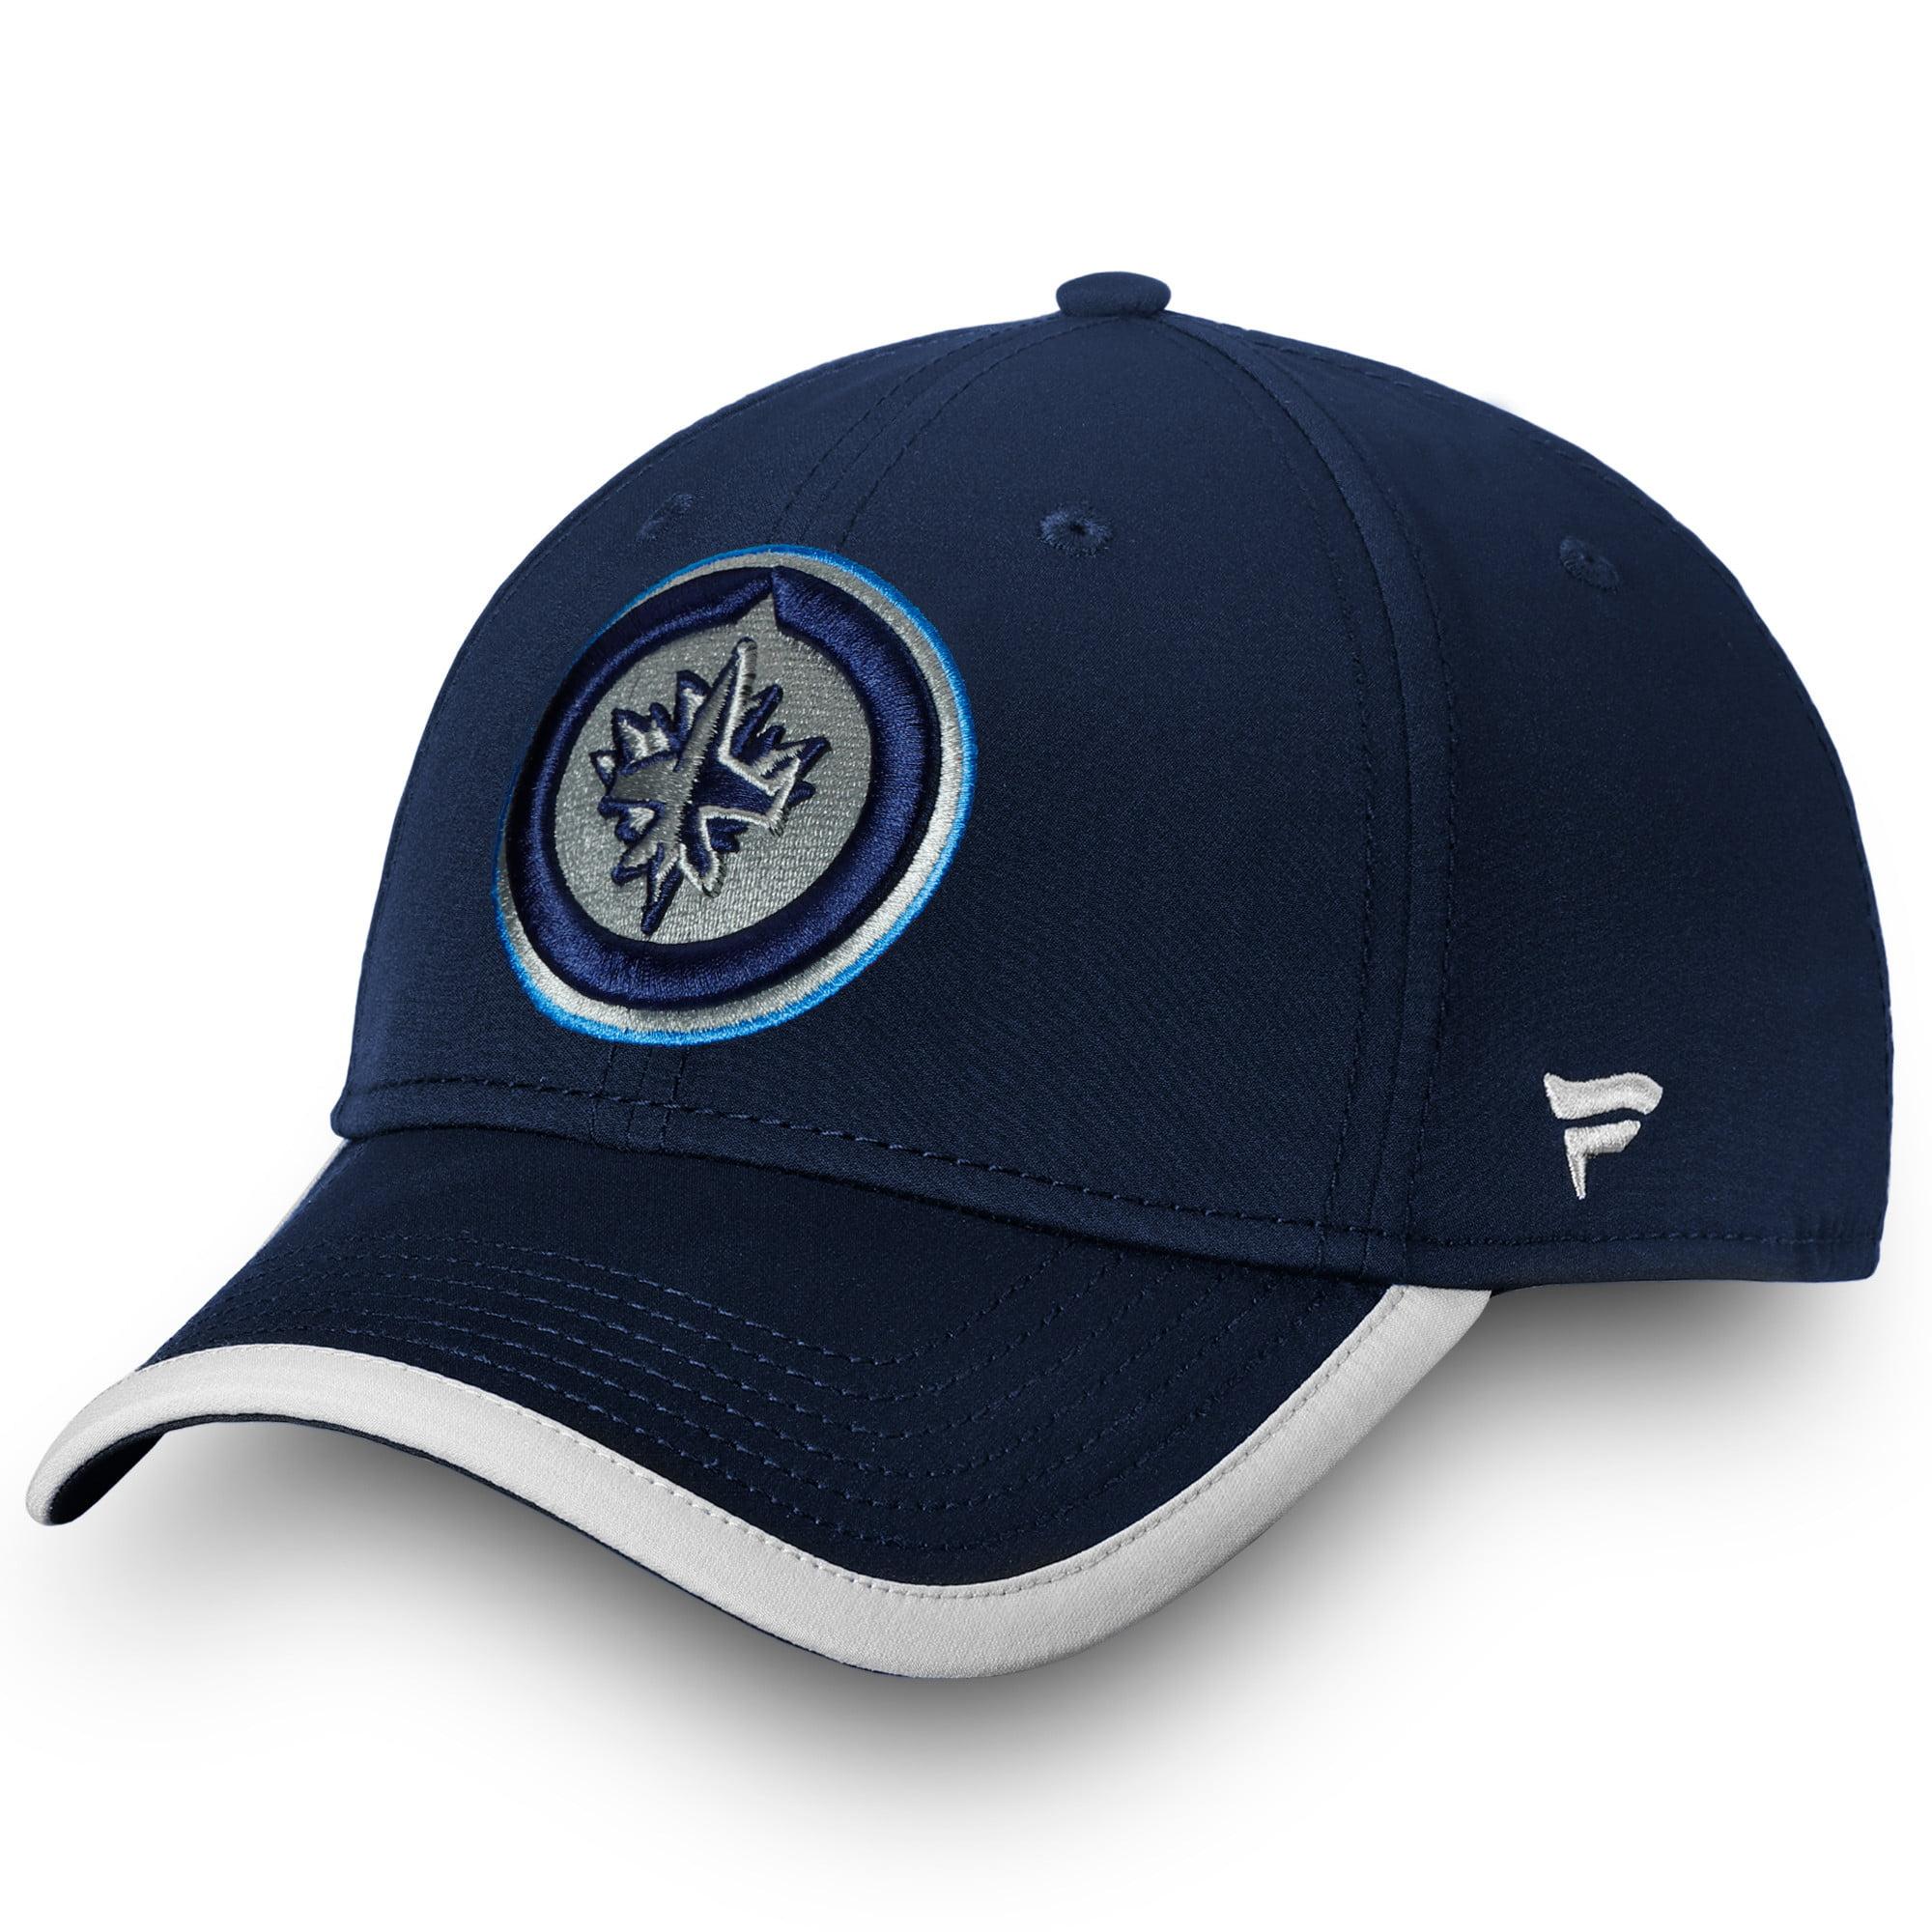 Winnipeg Jets Fanatics Branded Authentic Pro Clutch Speed Flex Hat - Navy